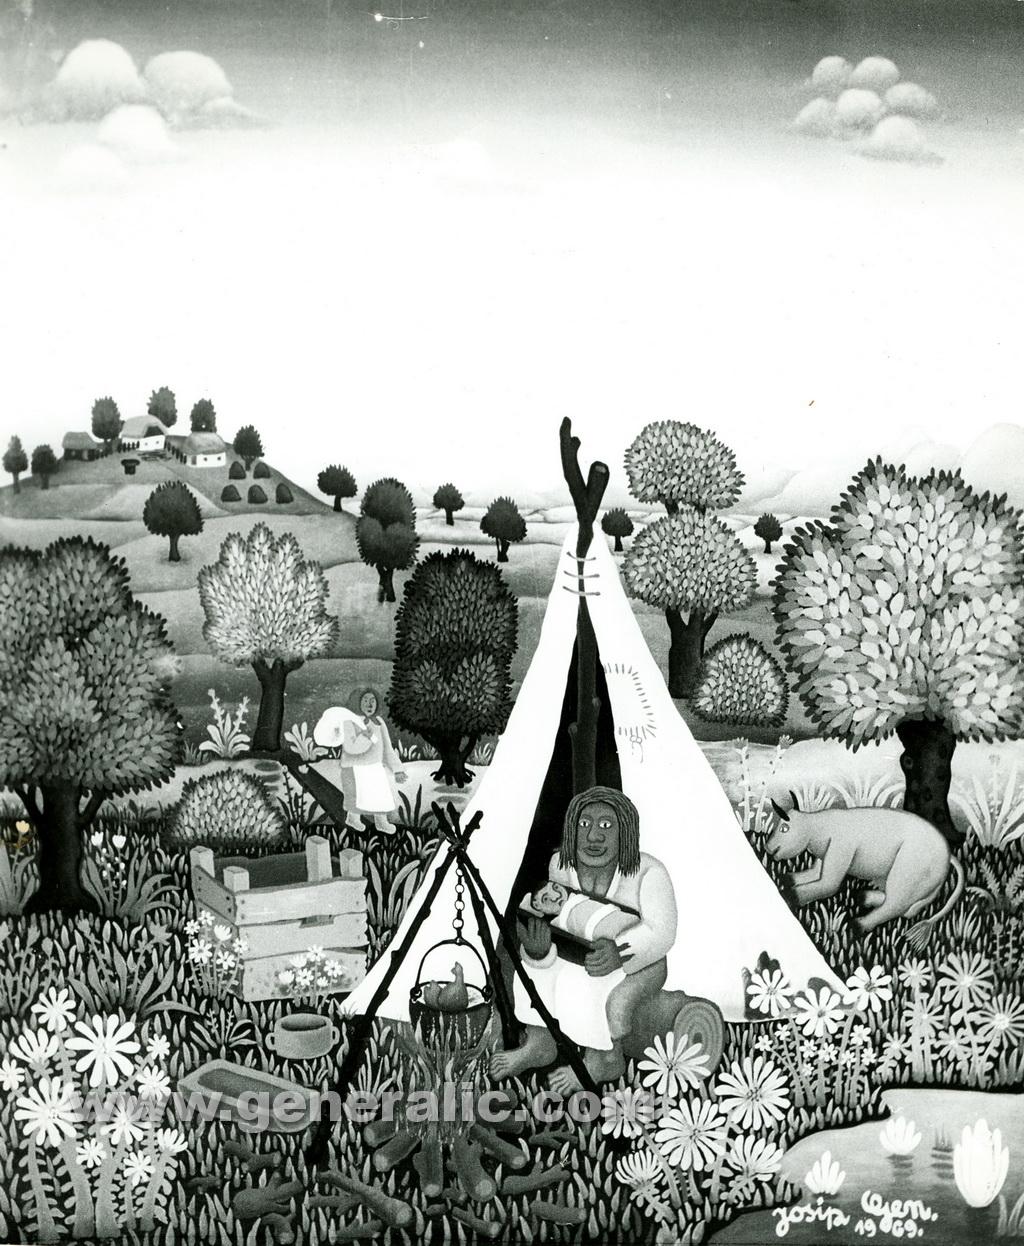 Josip Generalic, 1969, Gypsies, oil on glass